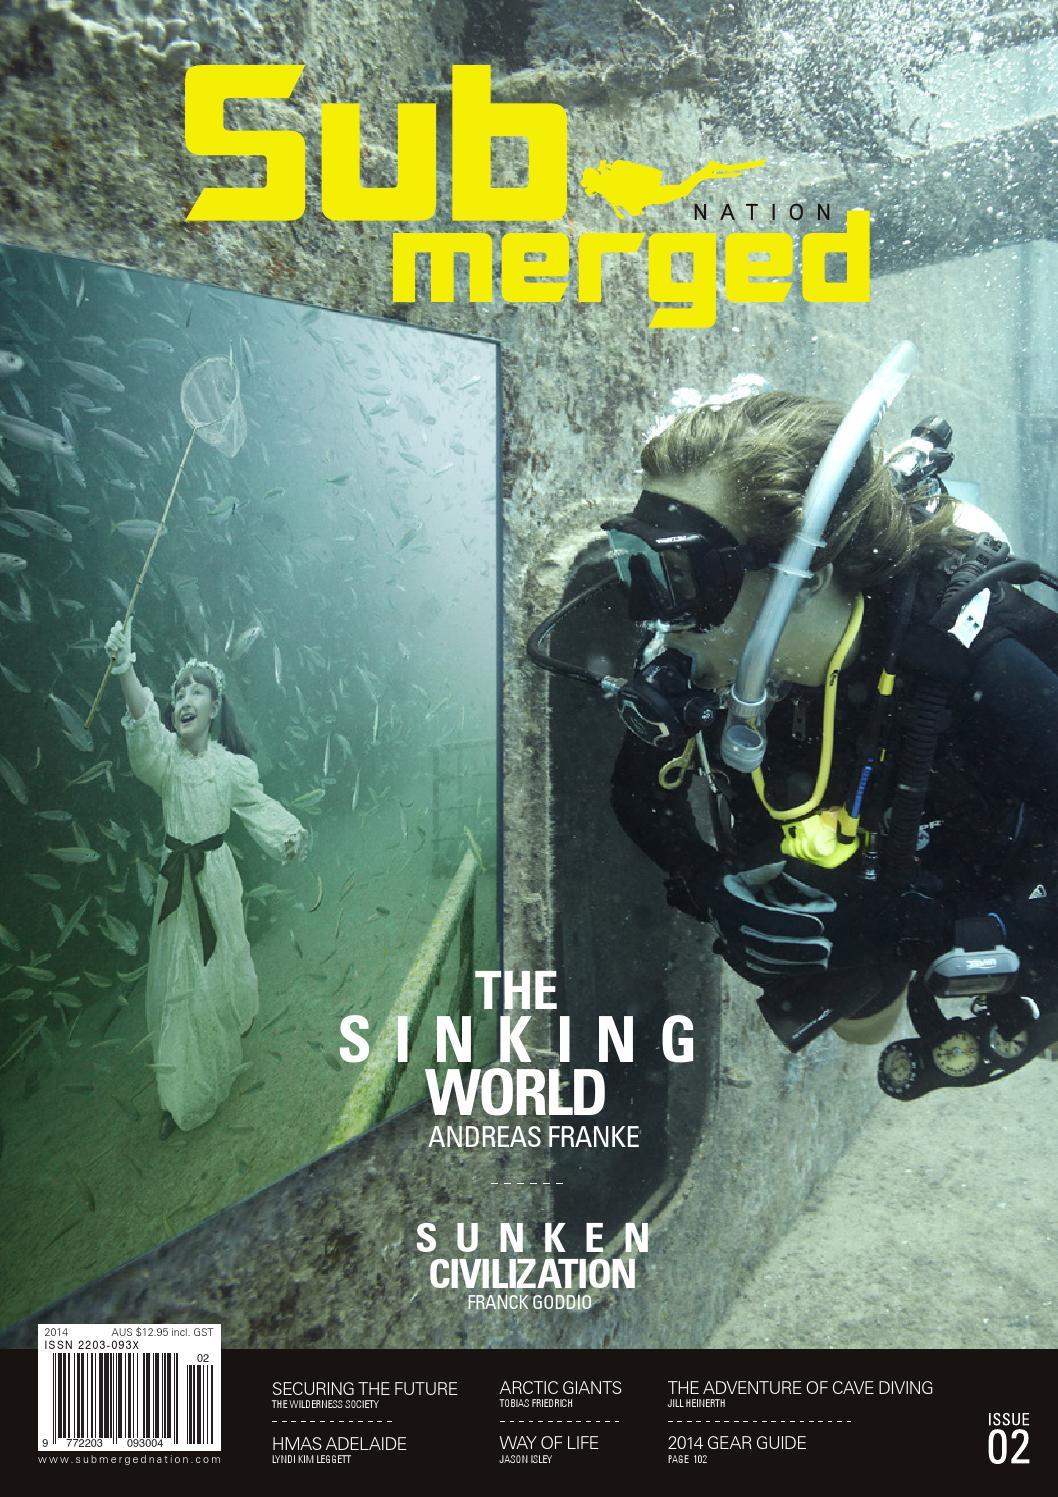 Durable Scuba Diving 30lbs Lift Bag Dive Salvage Bag Finger Spool Reel 30m Line